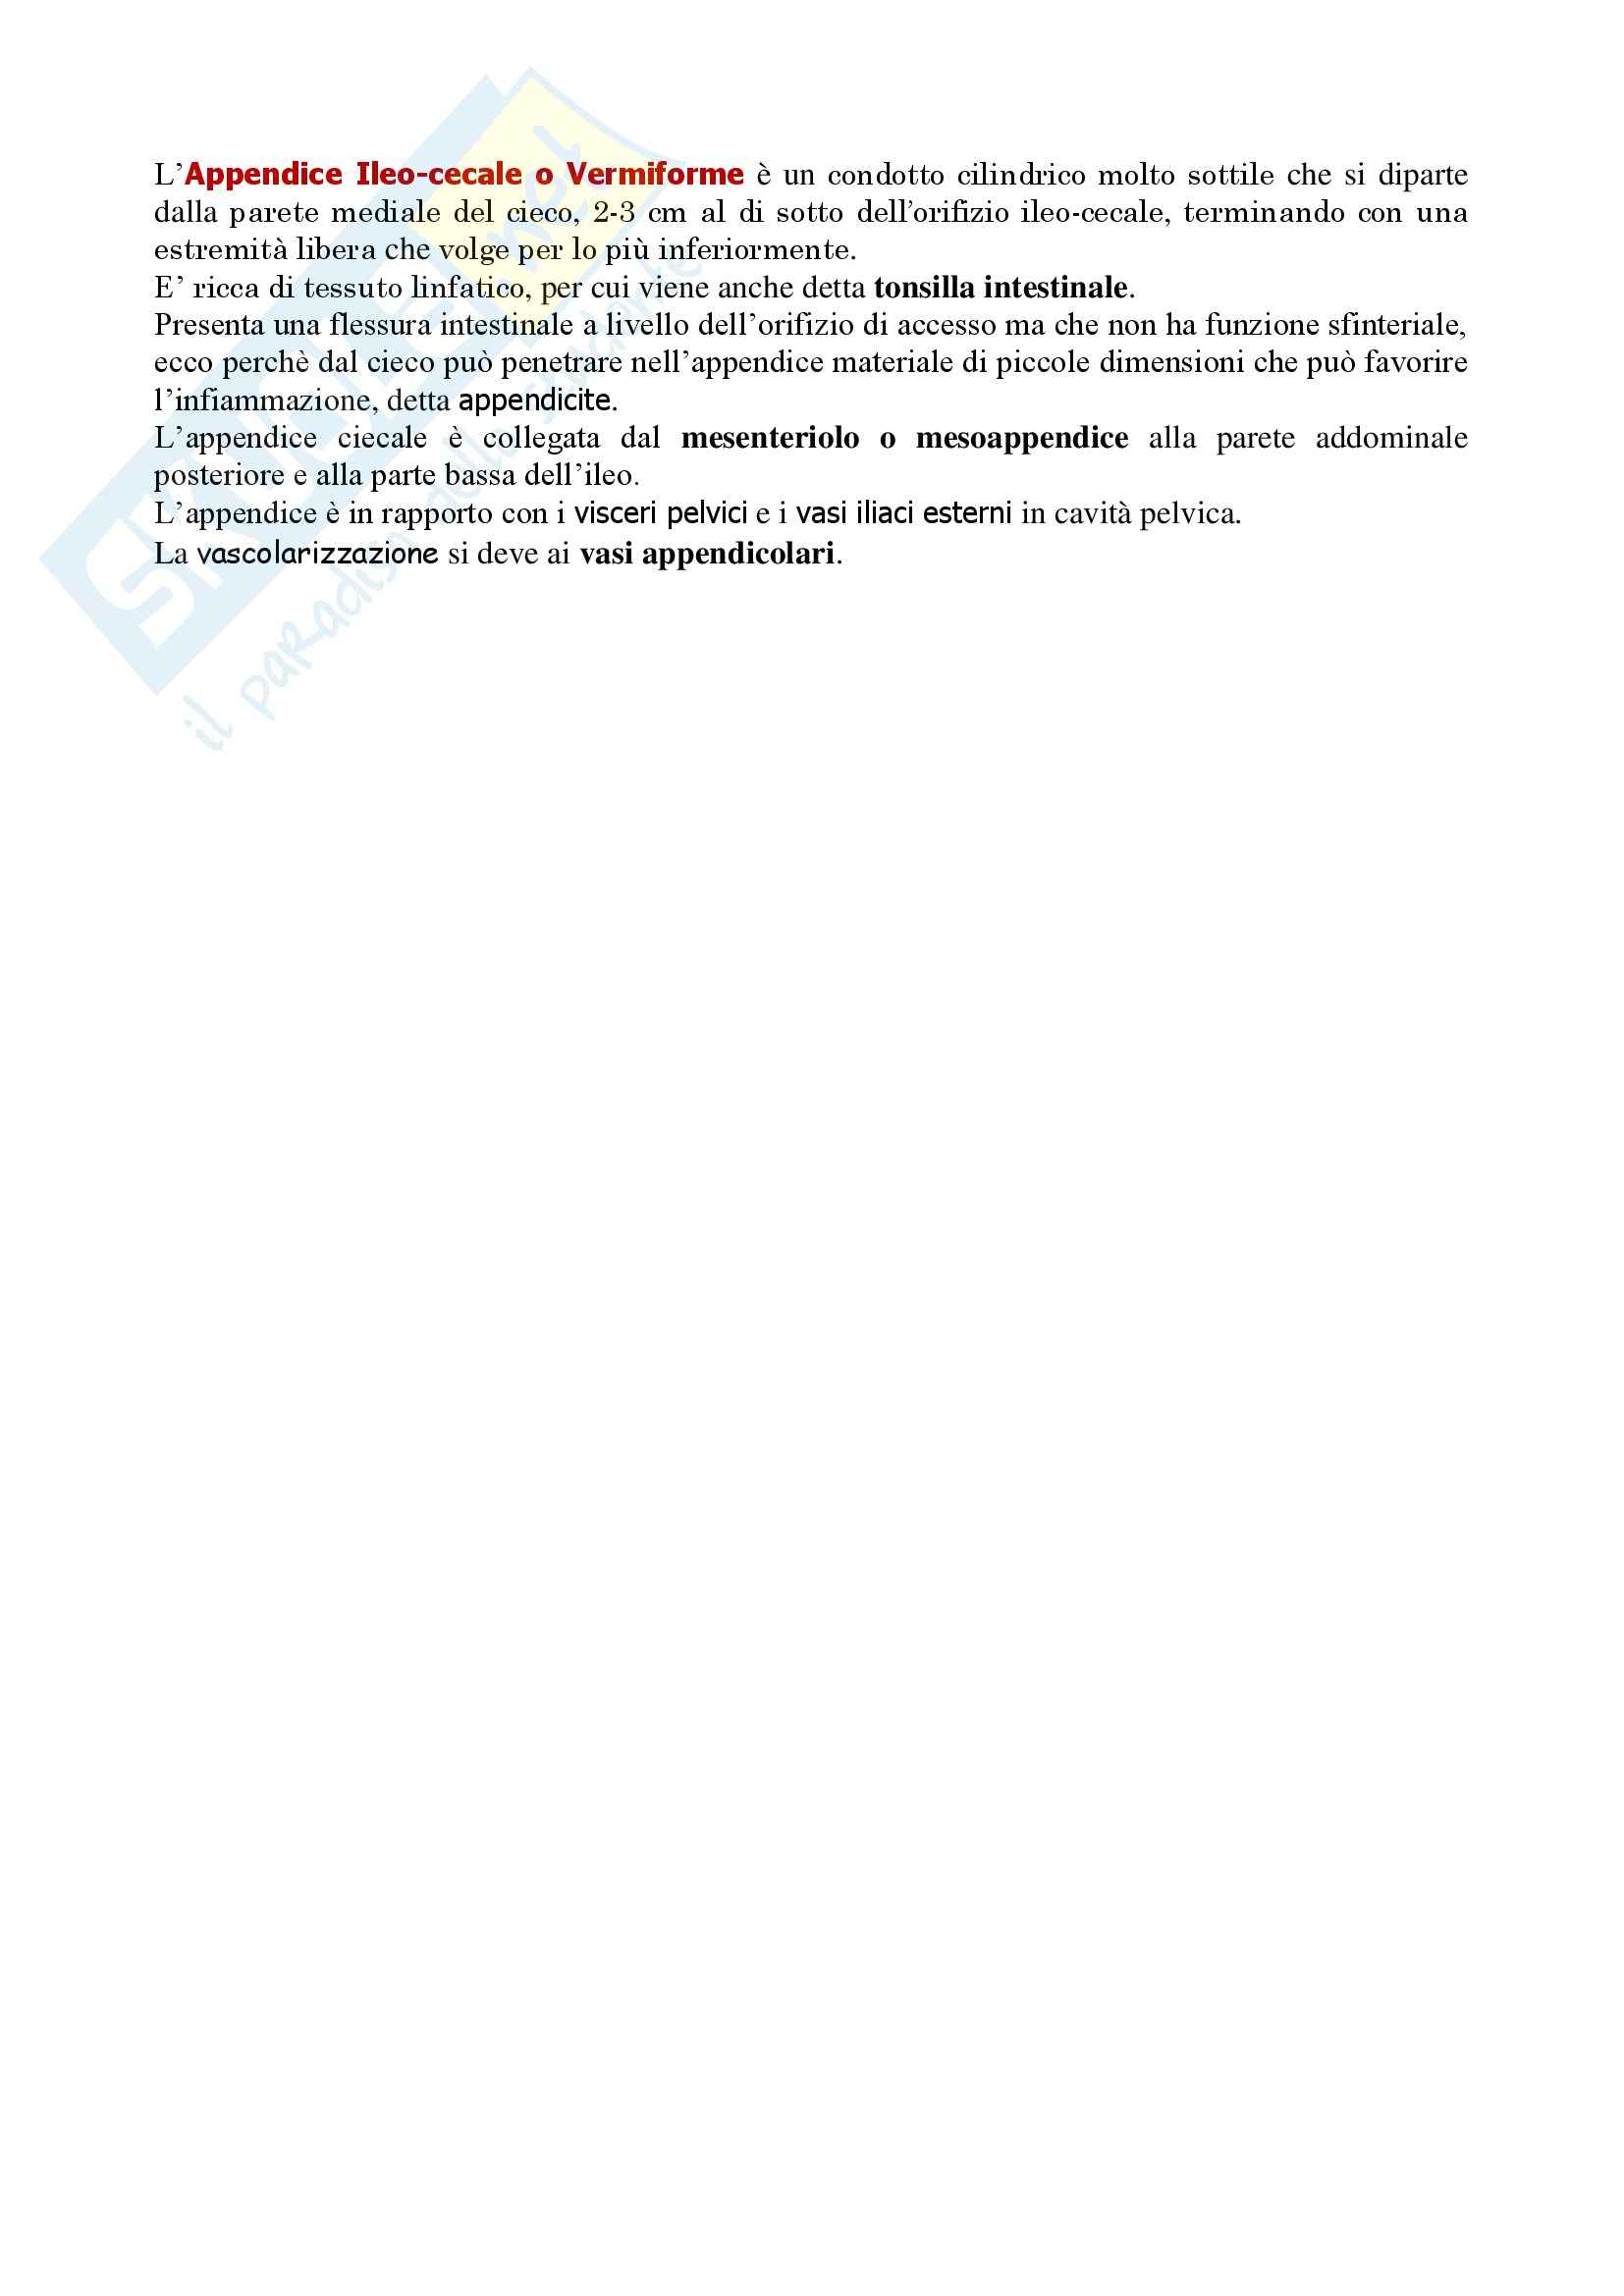 Anatomia umana - Appendice Ileo Cecale